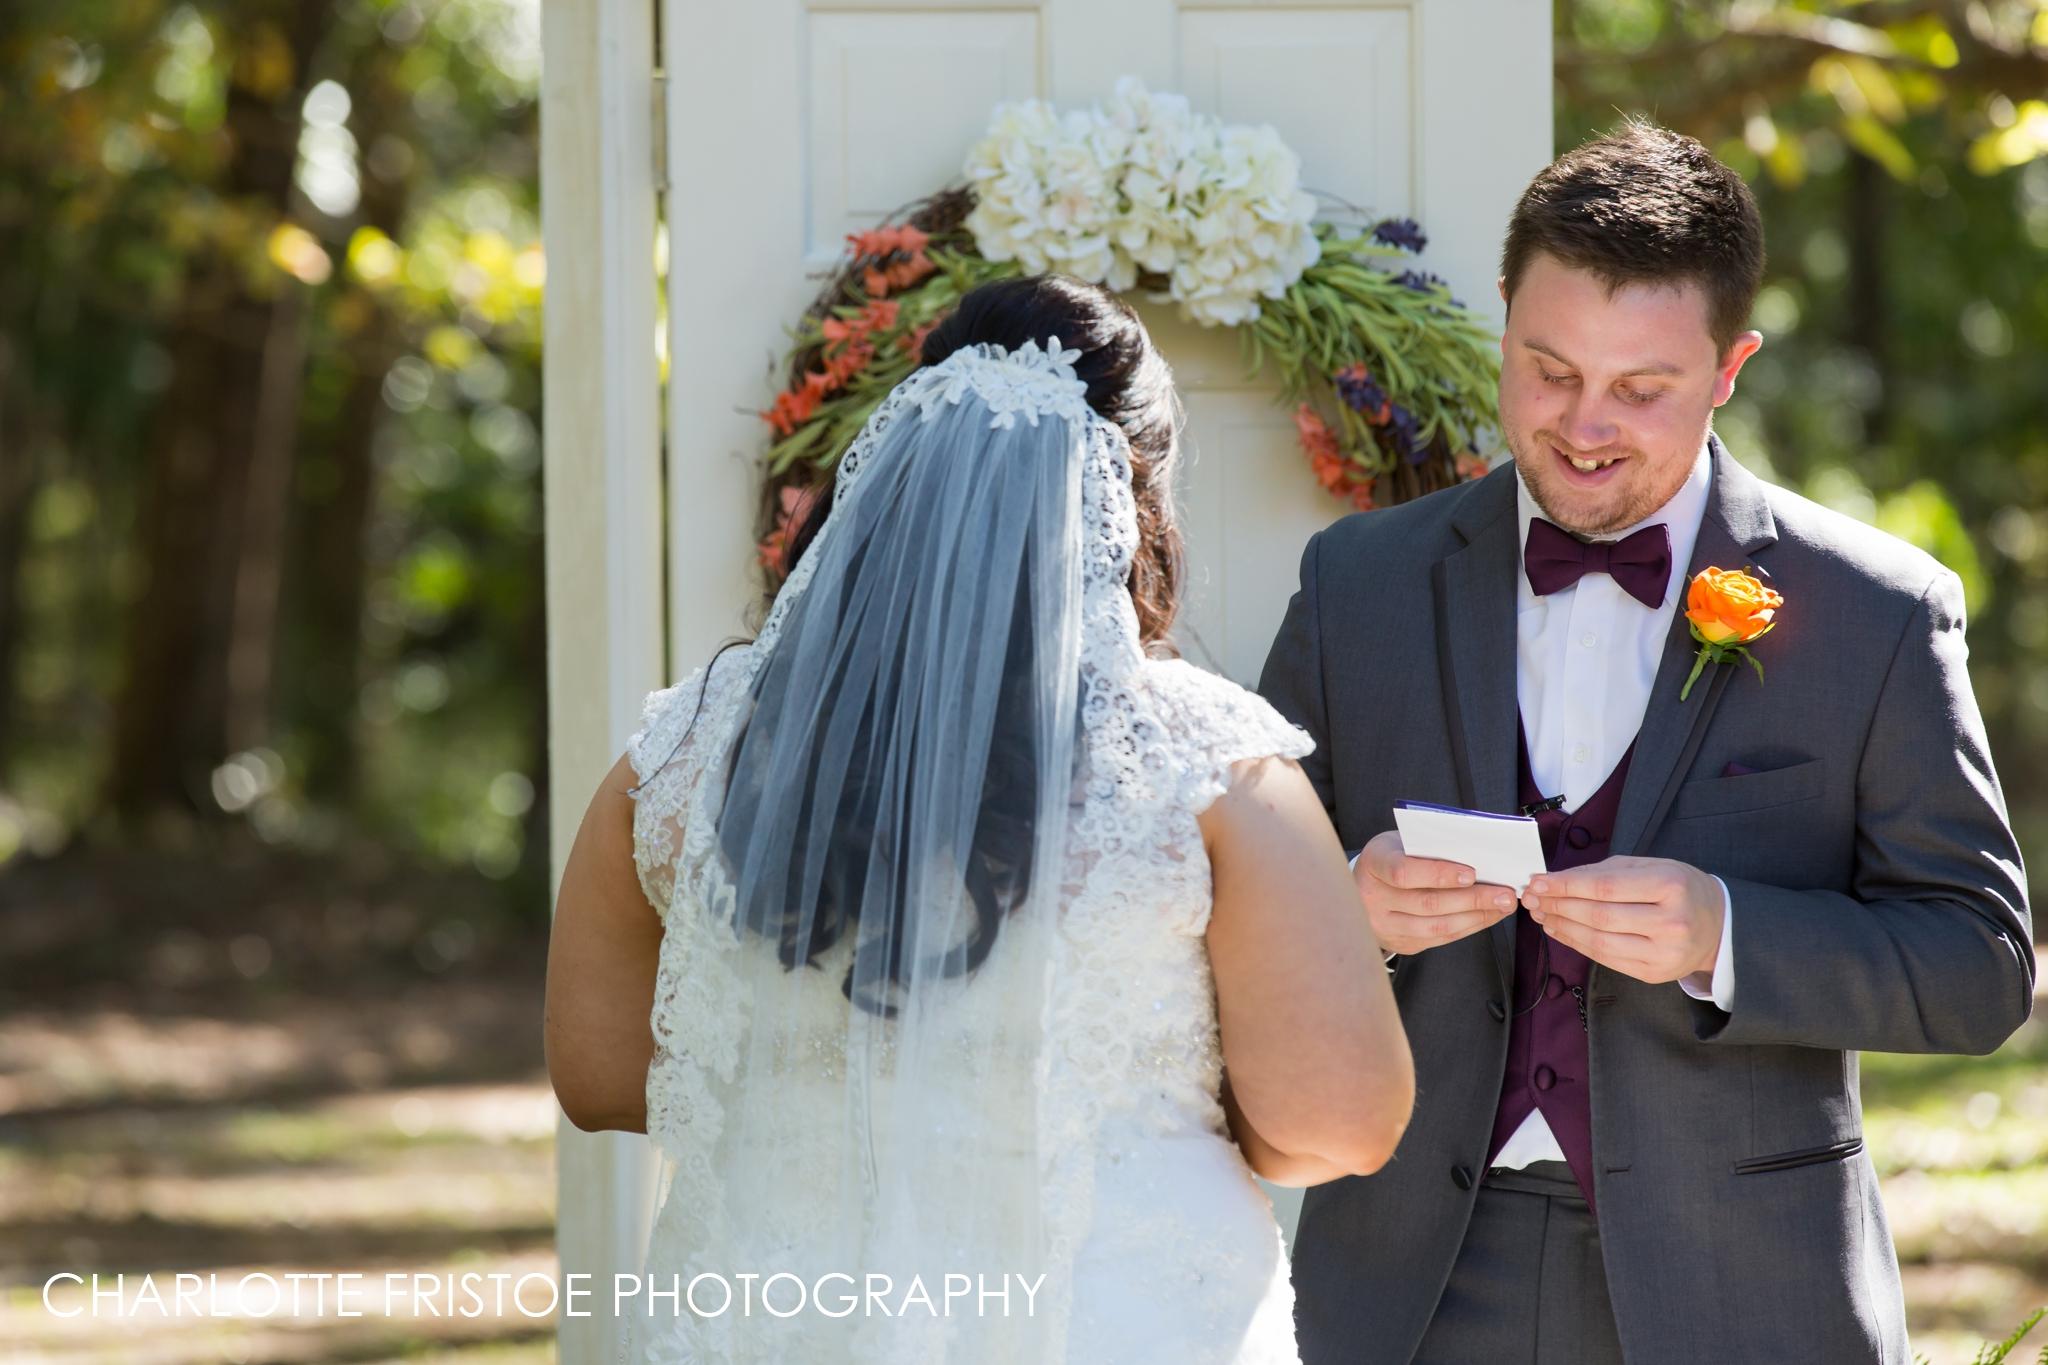 Lake Iamonia Wedding Charlotte Fristoe Photography-13.jpg